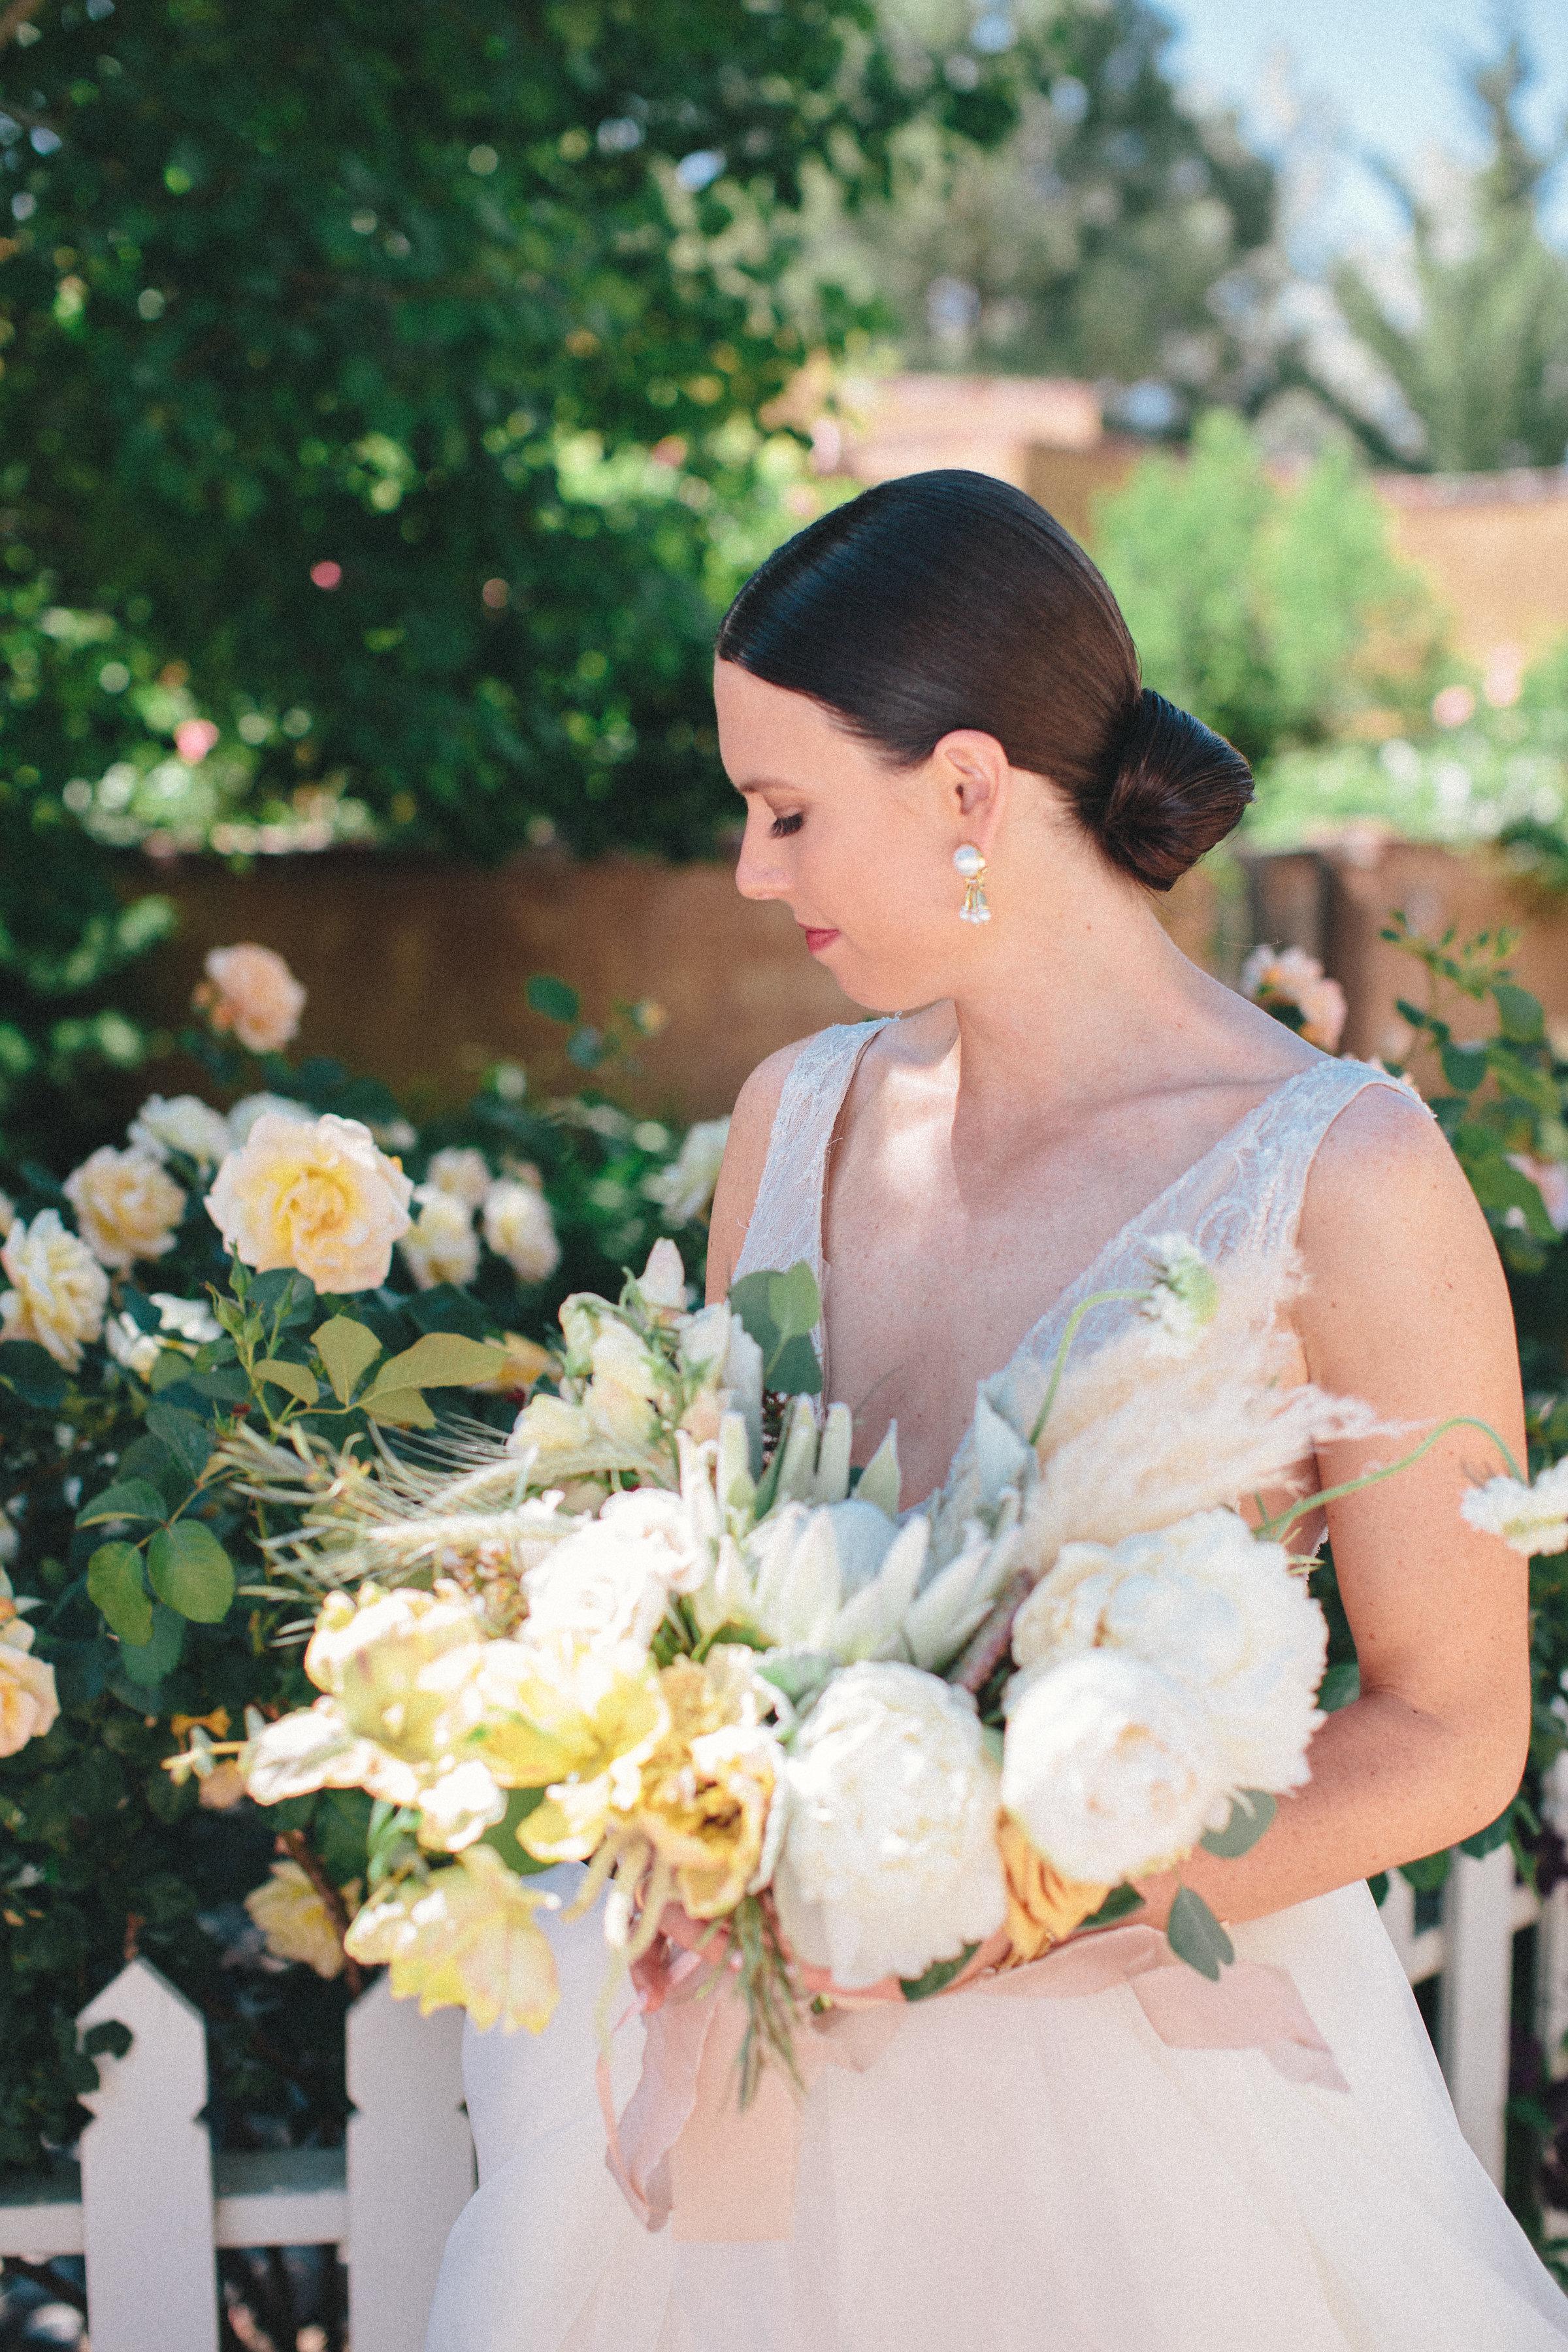 landry_lovelace_wedding_jbobephoto-188.jpg